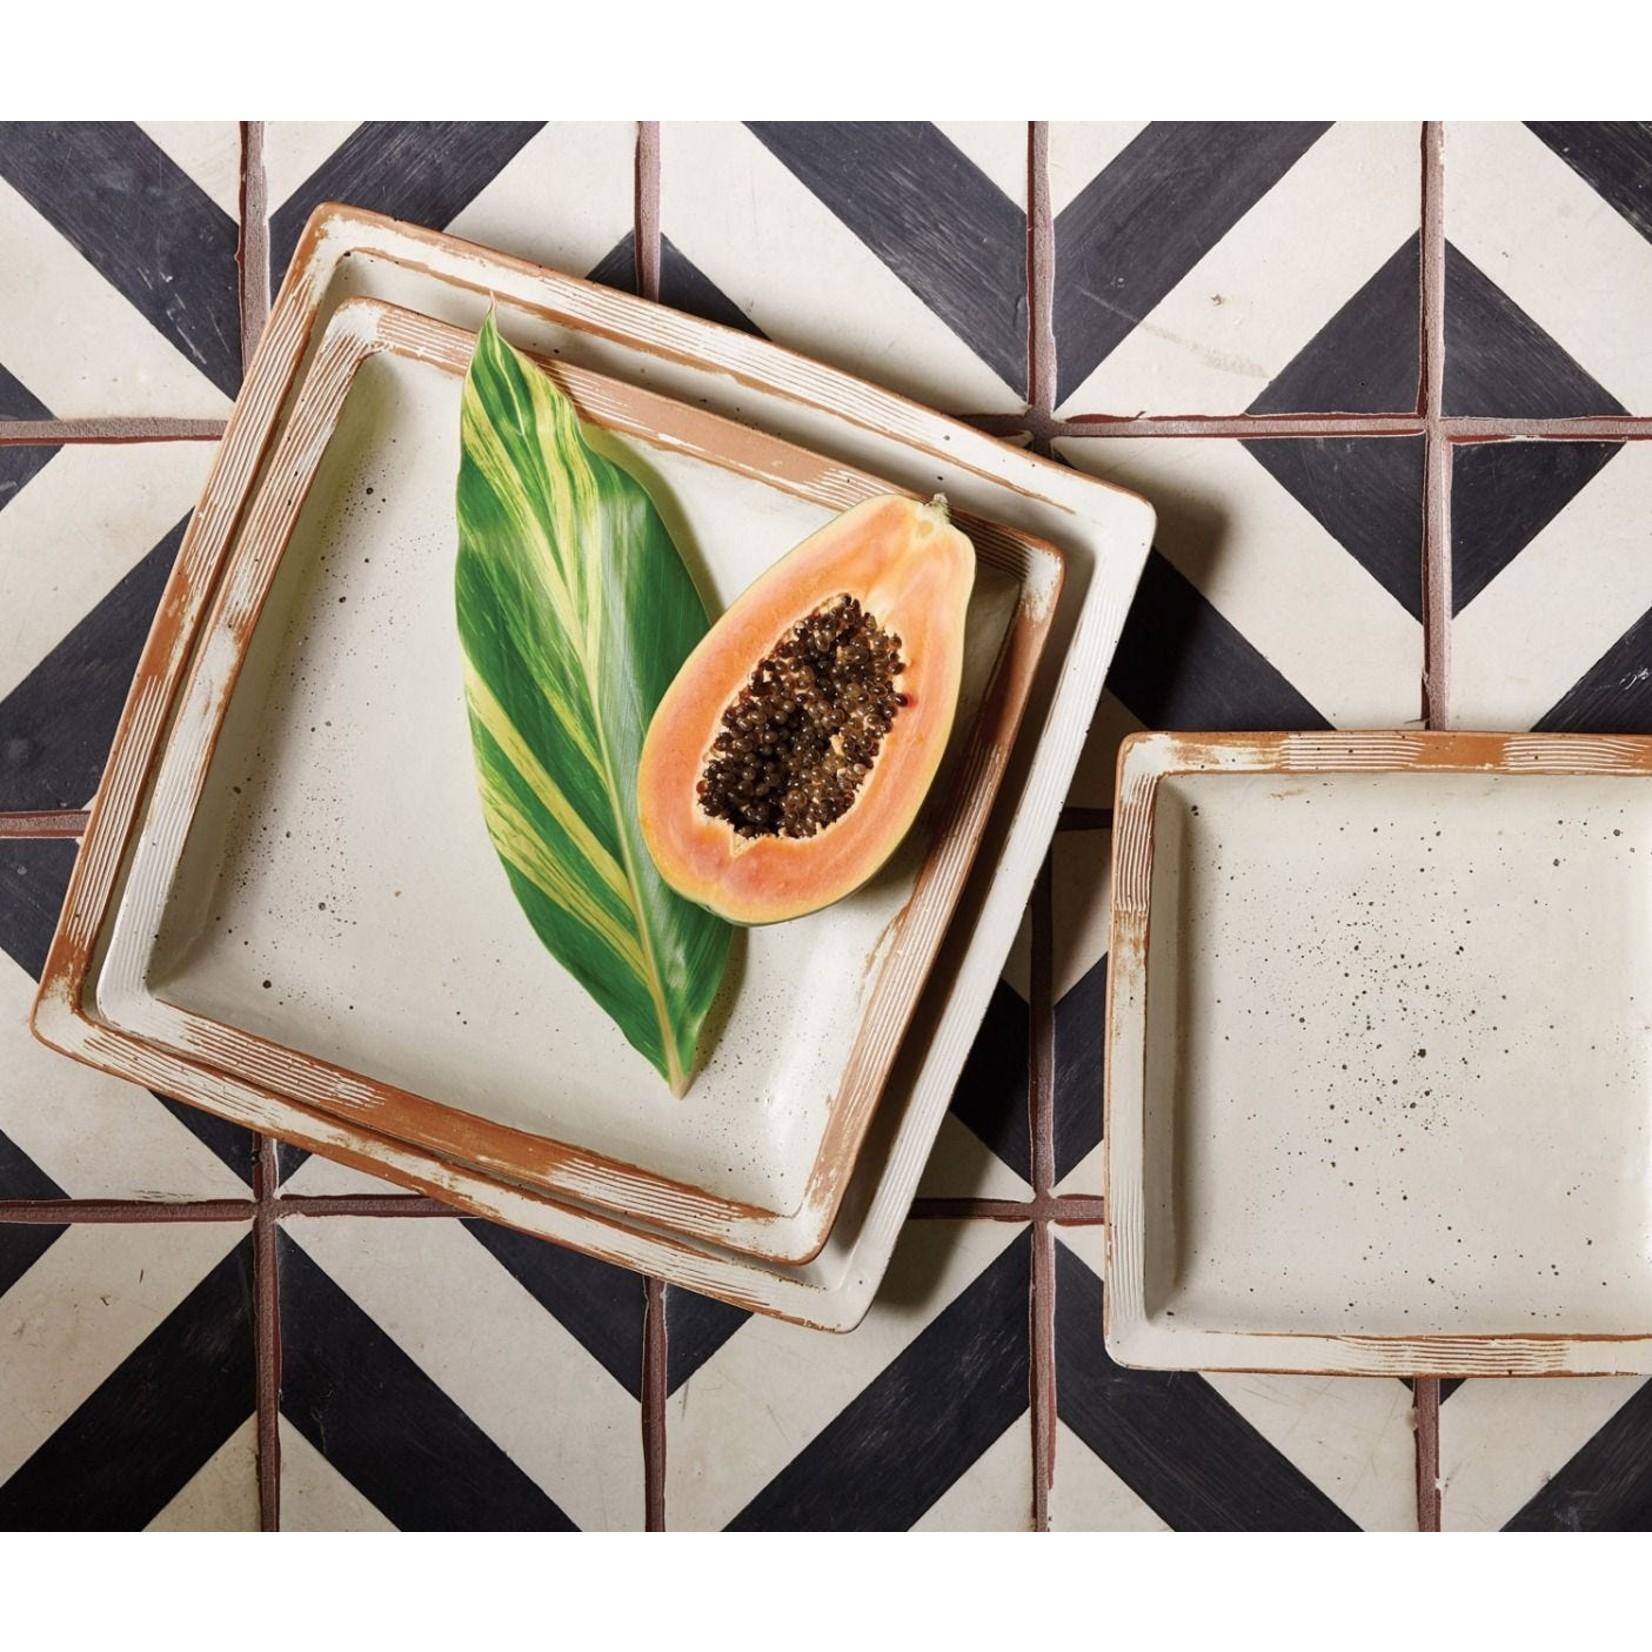 Blue Pheasant Dawson Square Serving Platter